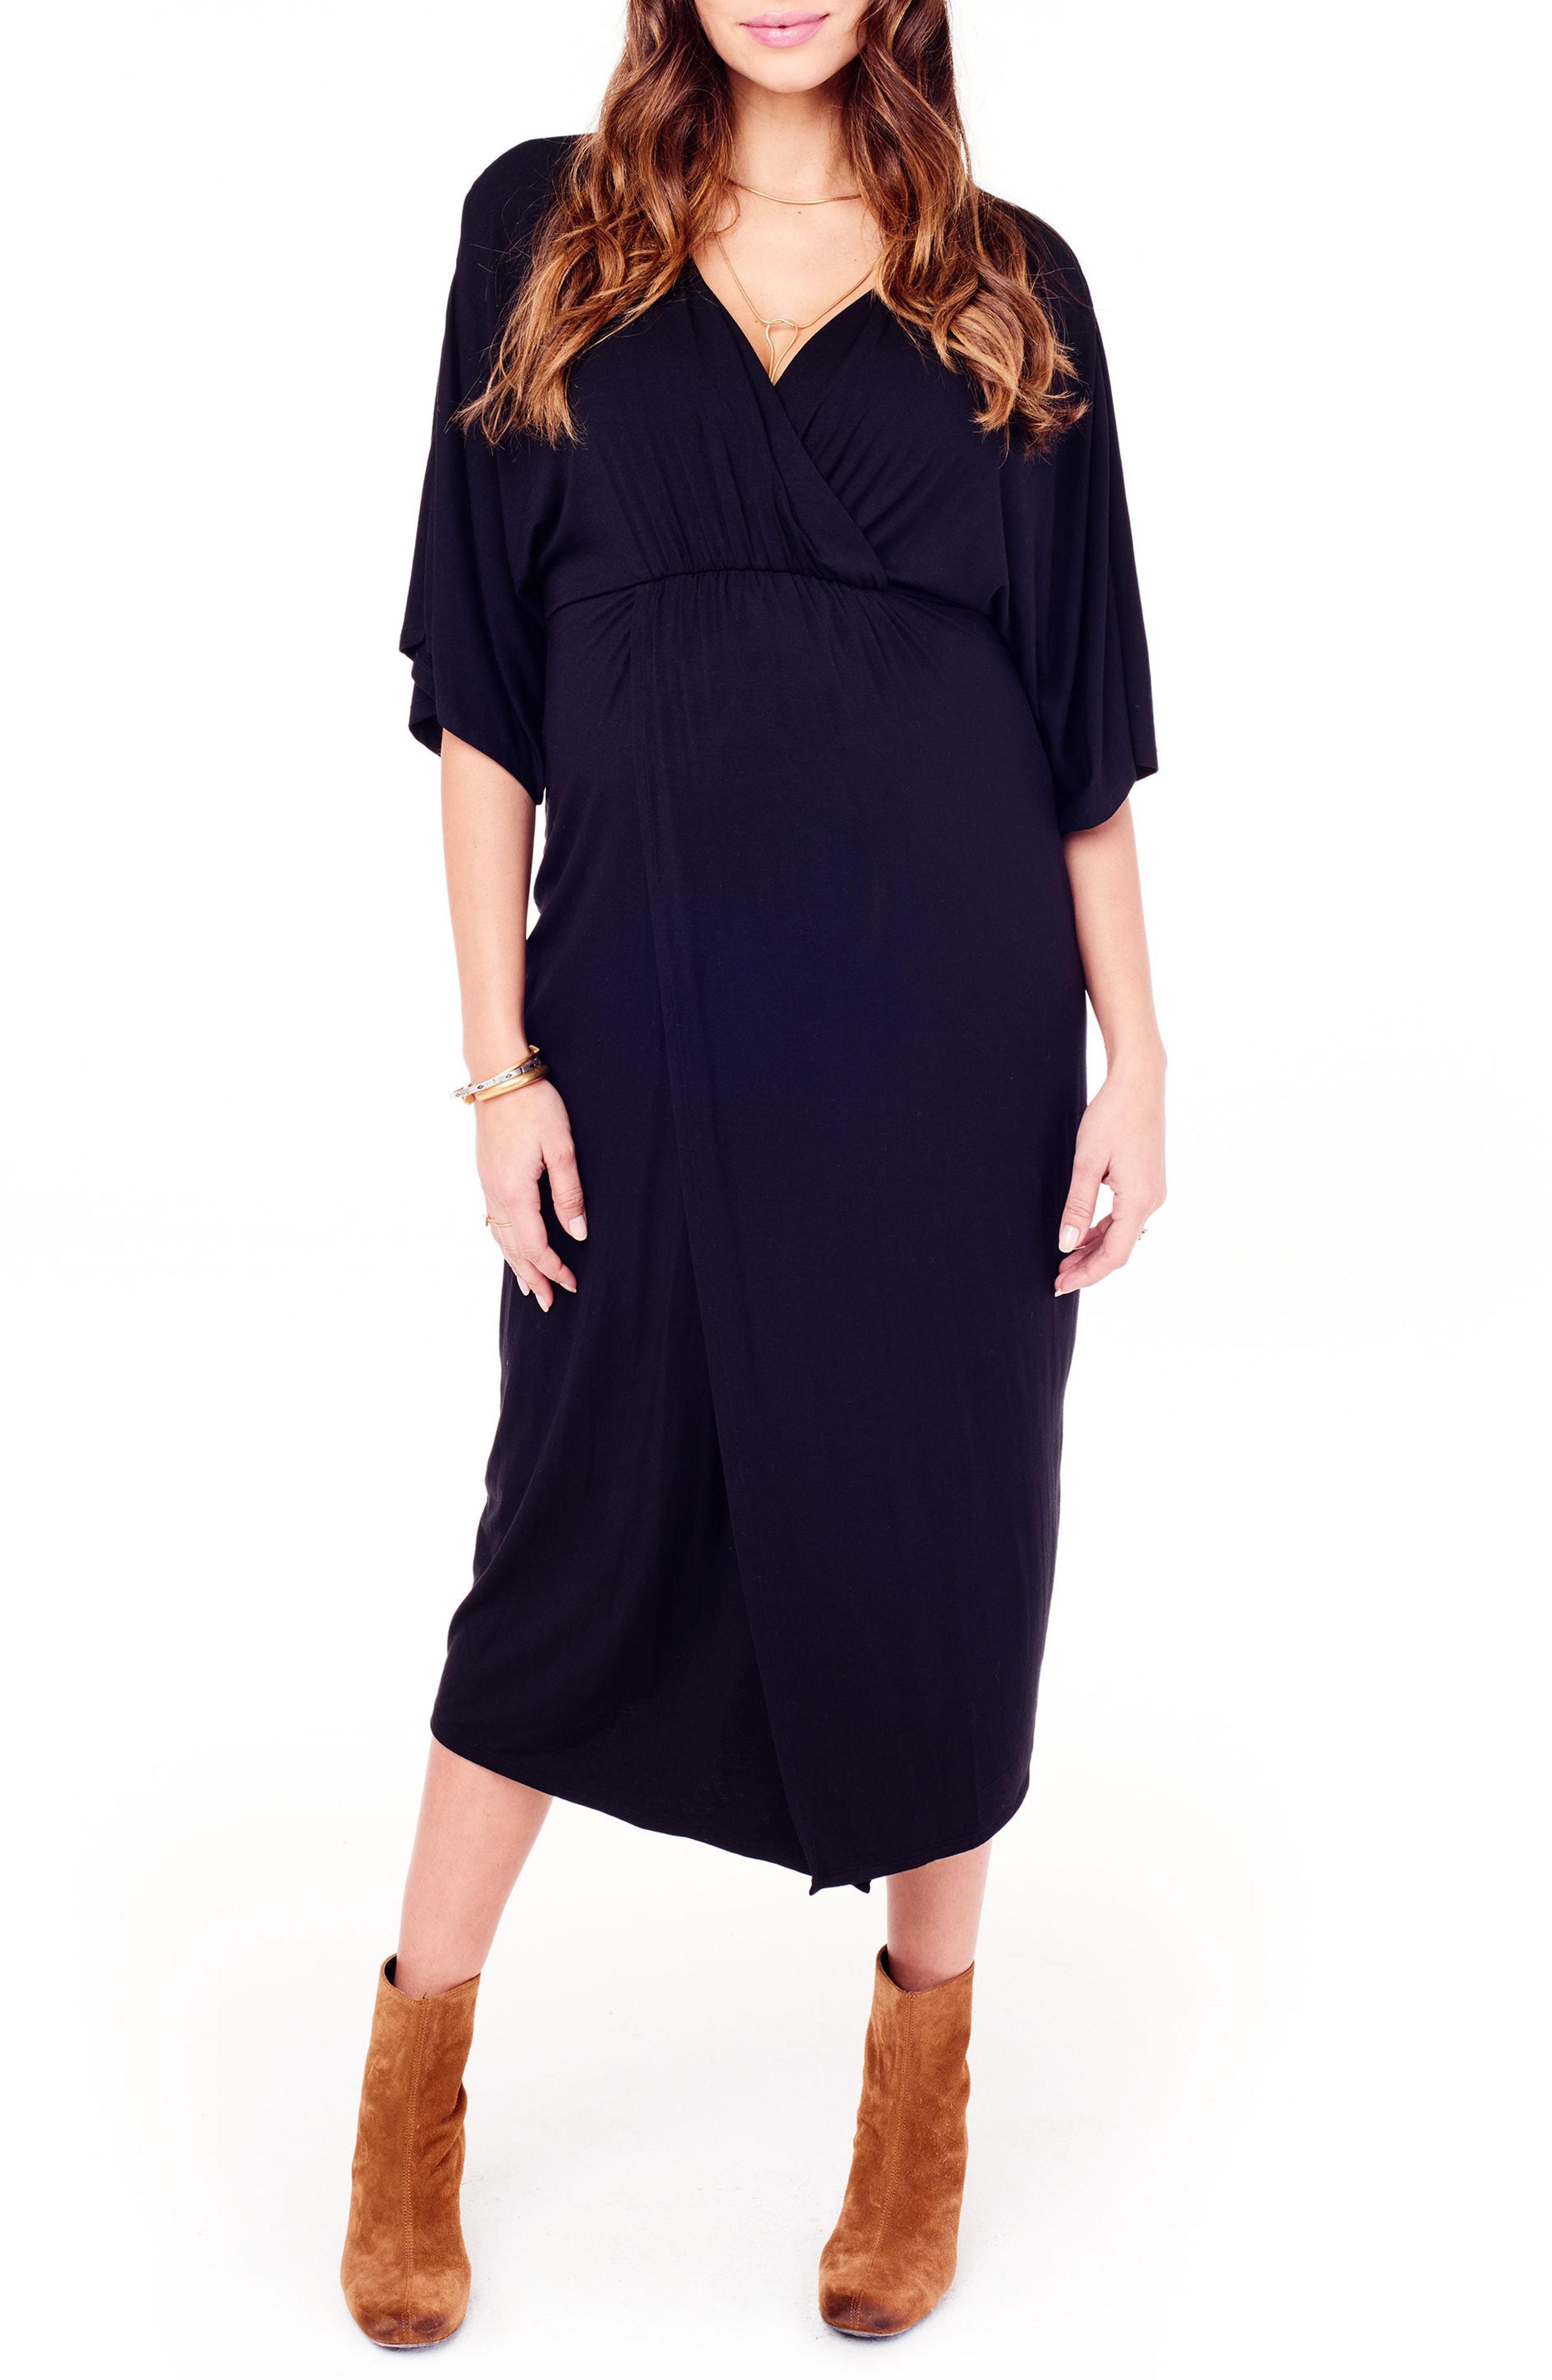 a85357fe67 Ingrid   Isabel. Women s Ingrid   Isabel Dolman Sleeve Maternity Dress